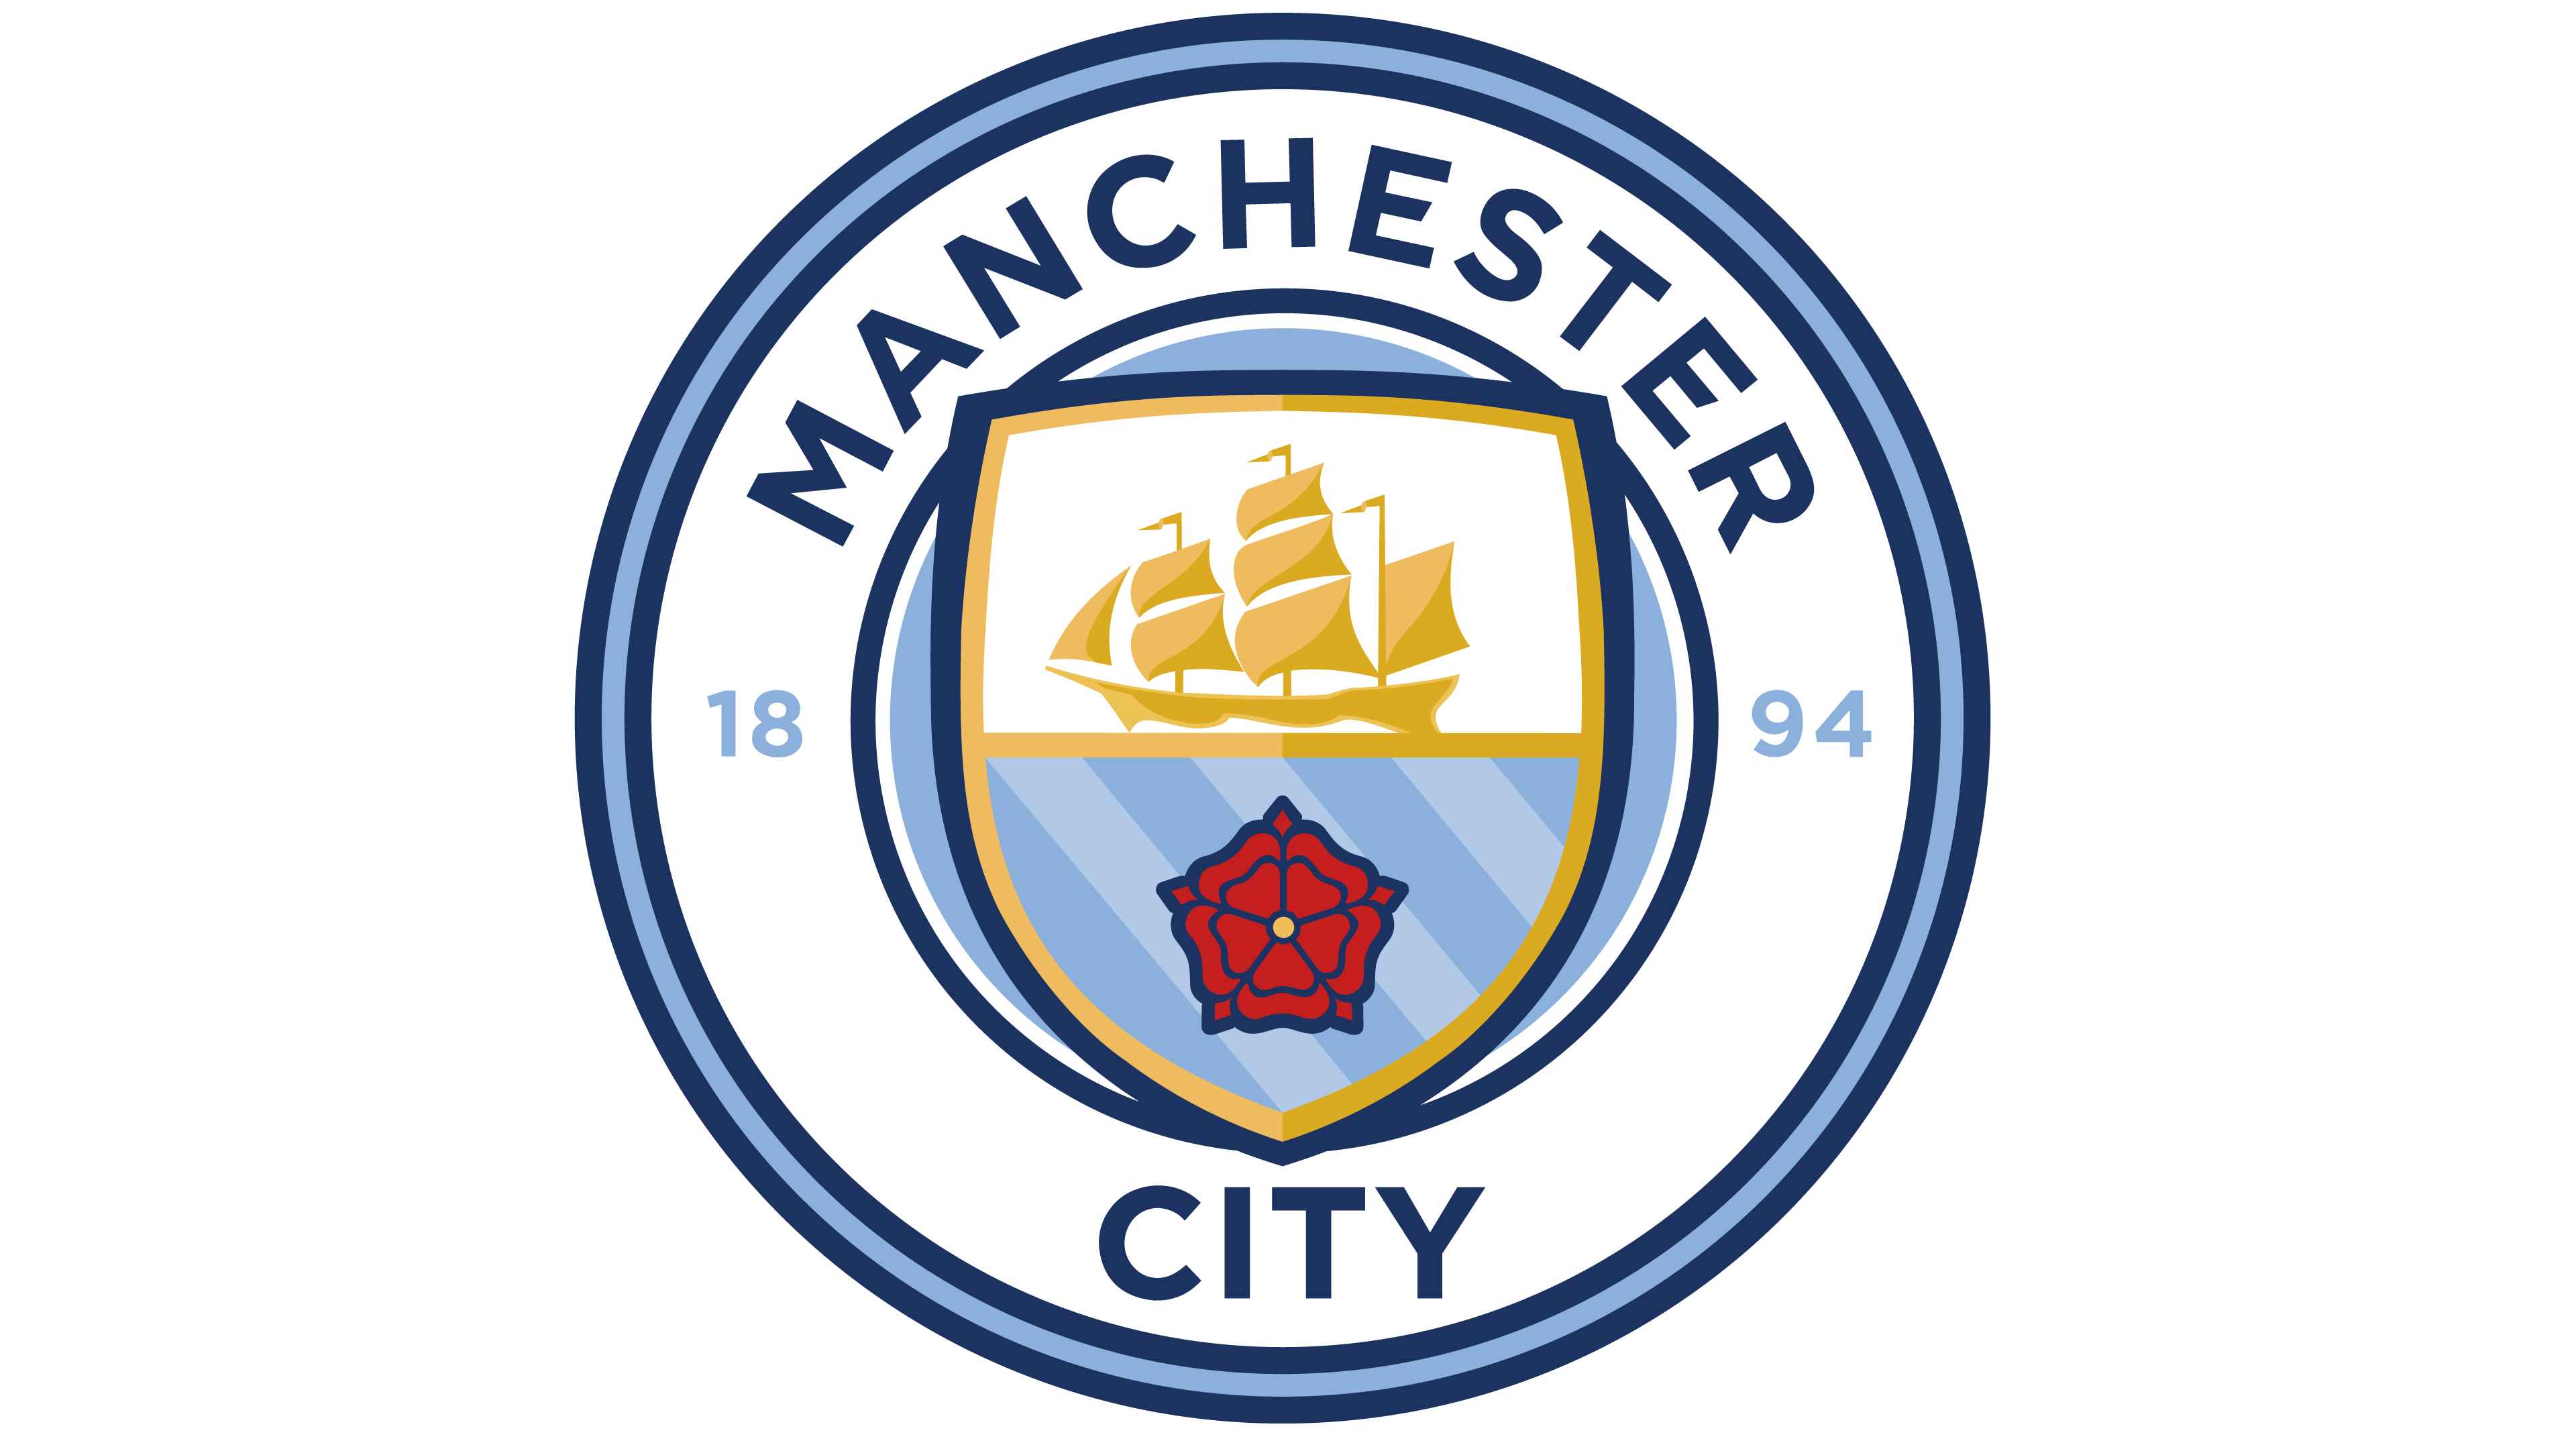 Pin By Raymond Muscat On Inter Milan Manchester City Logo Manchester City Manchester City Football Club